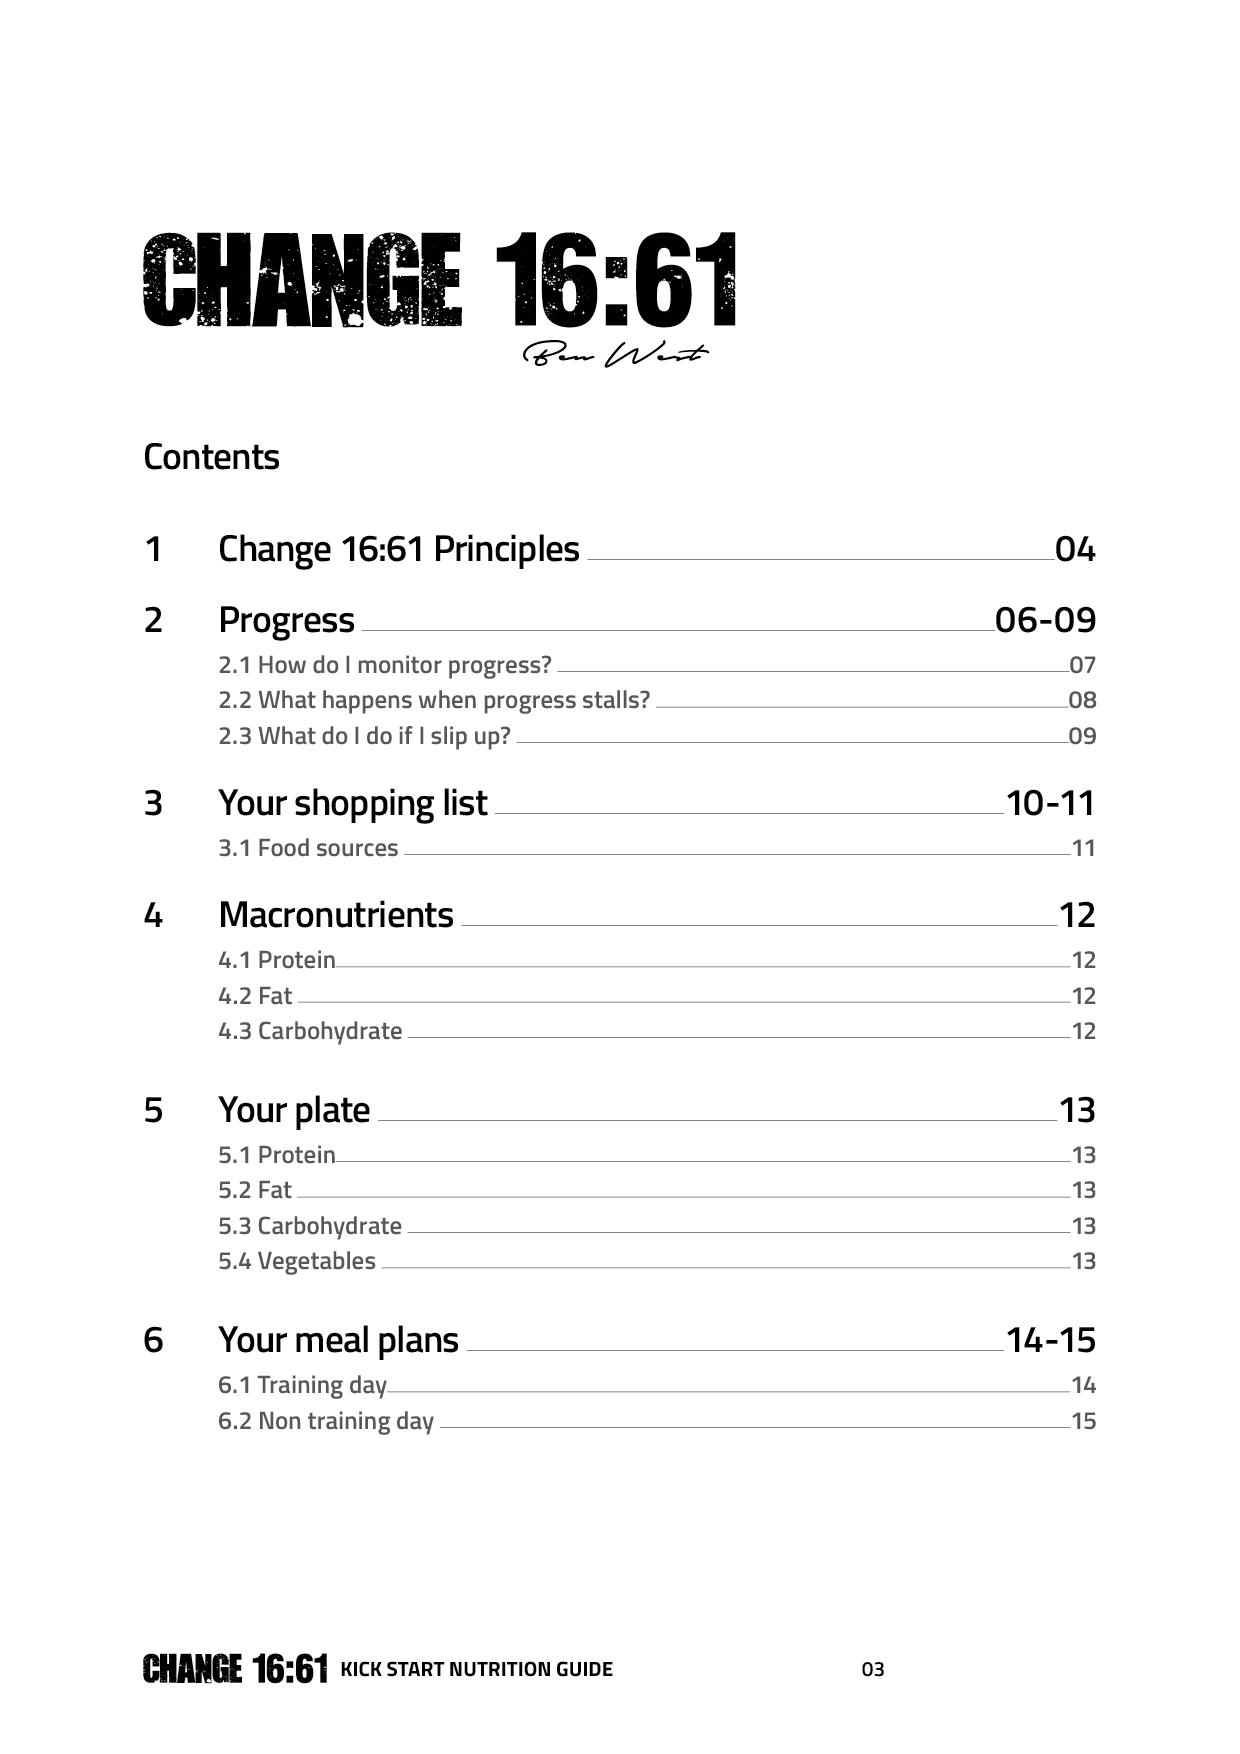 Change 16-61 Nutrition Kick Start2.jpg